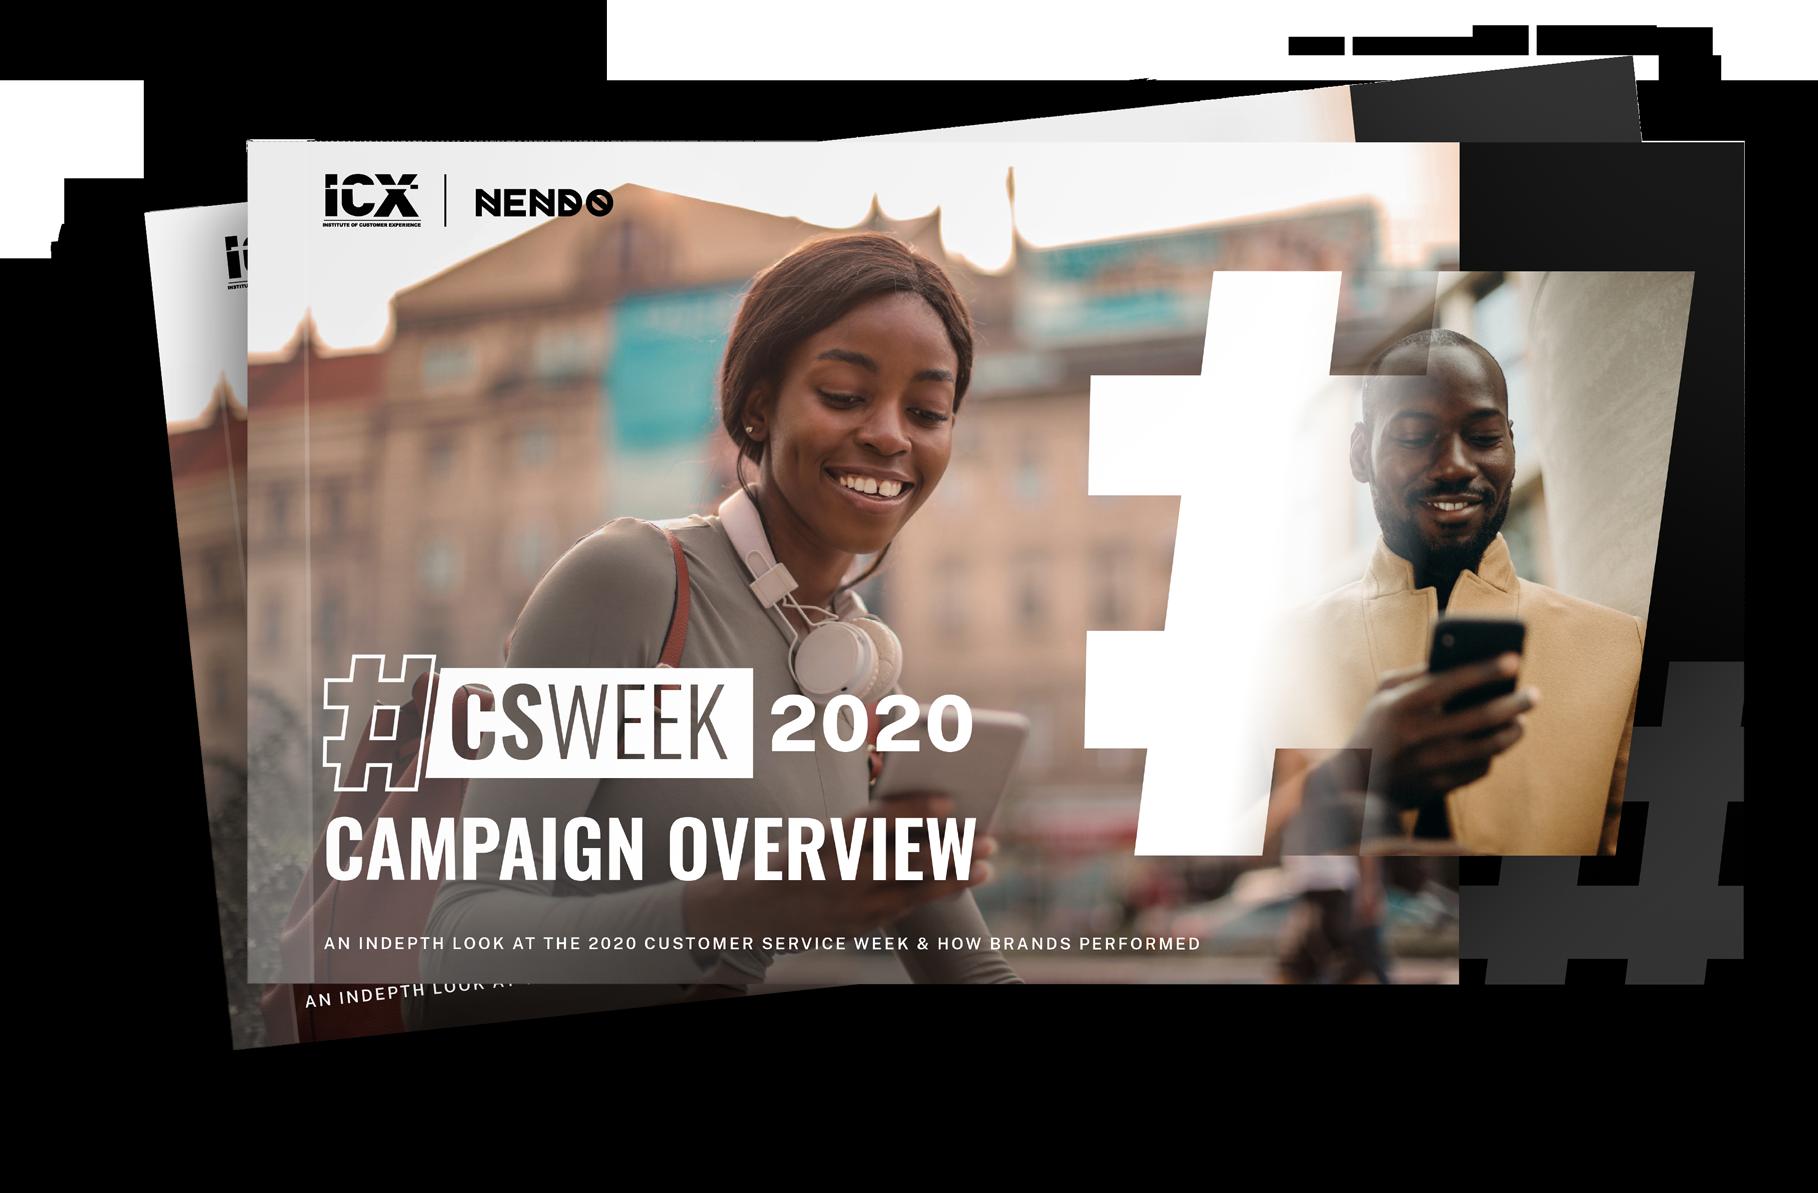 #CSWeek 2020 analysis report